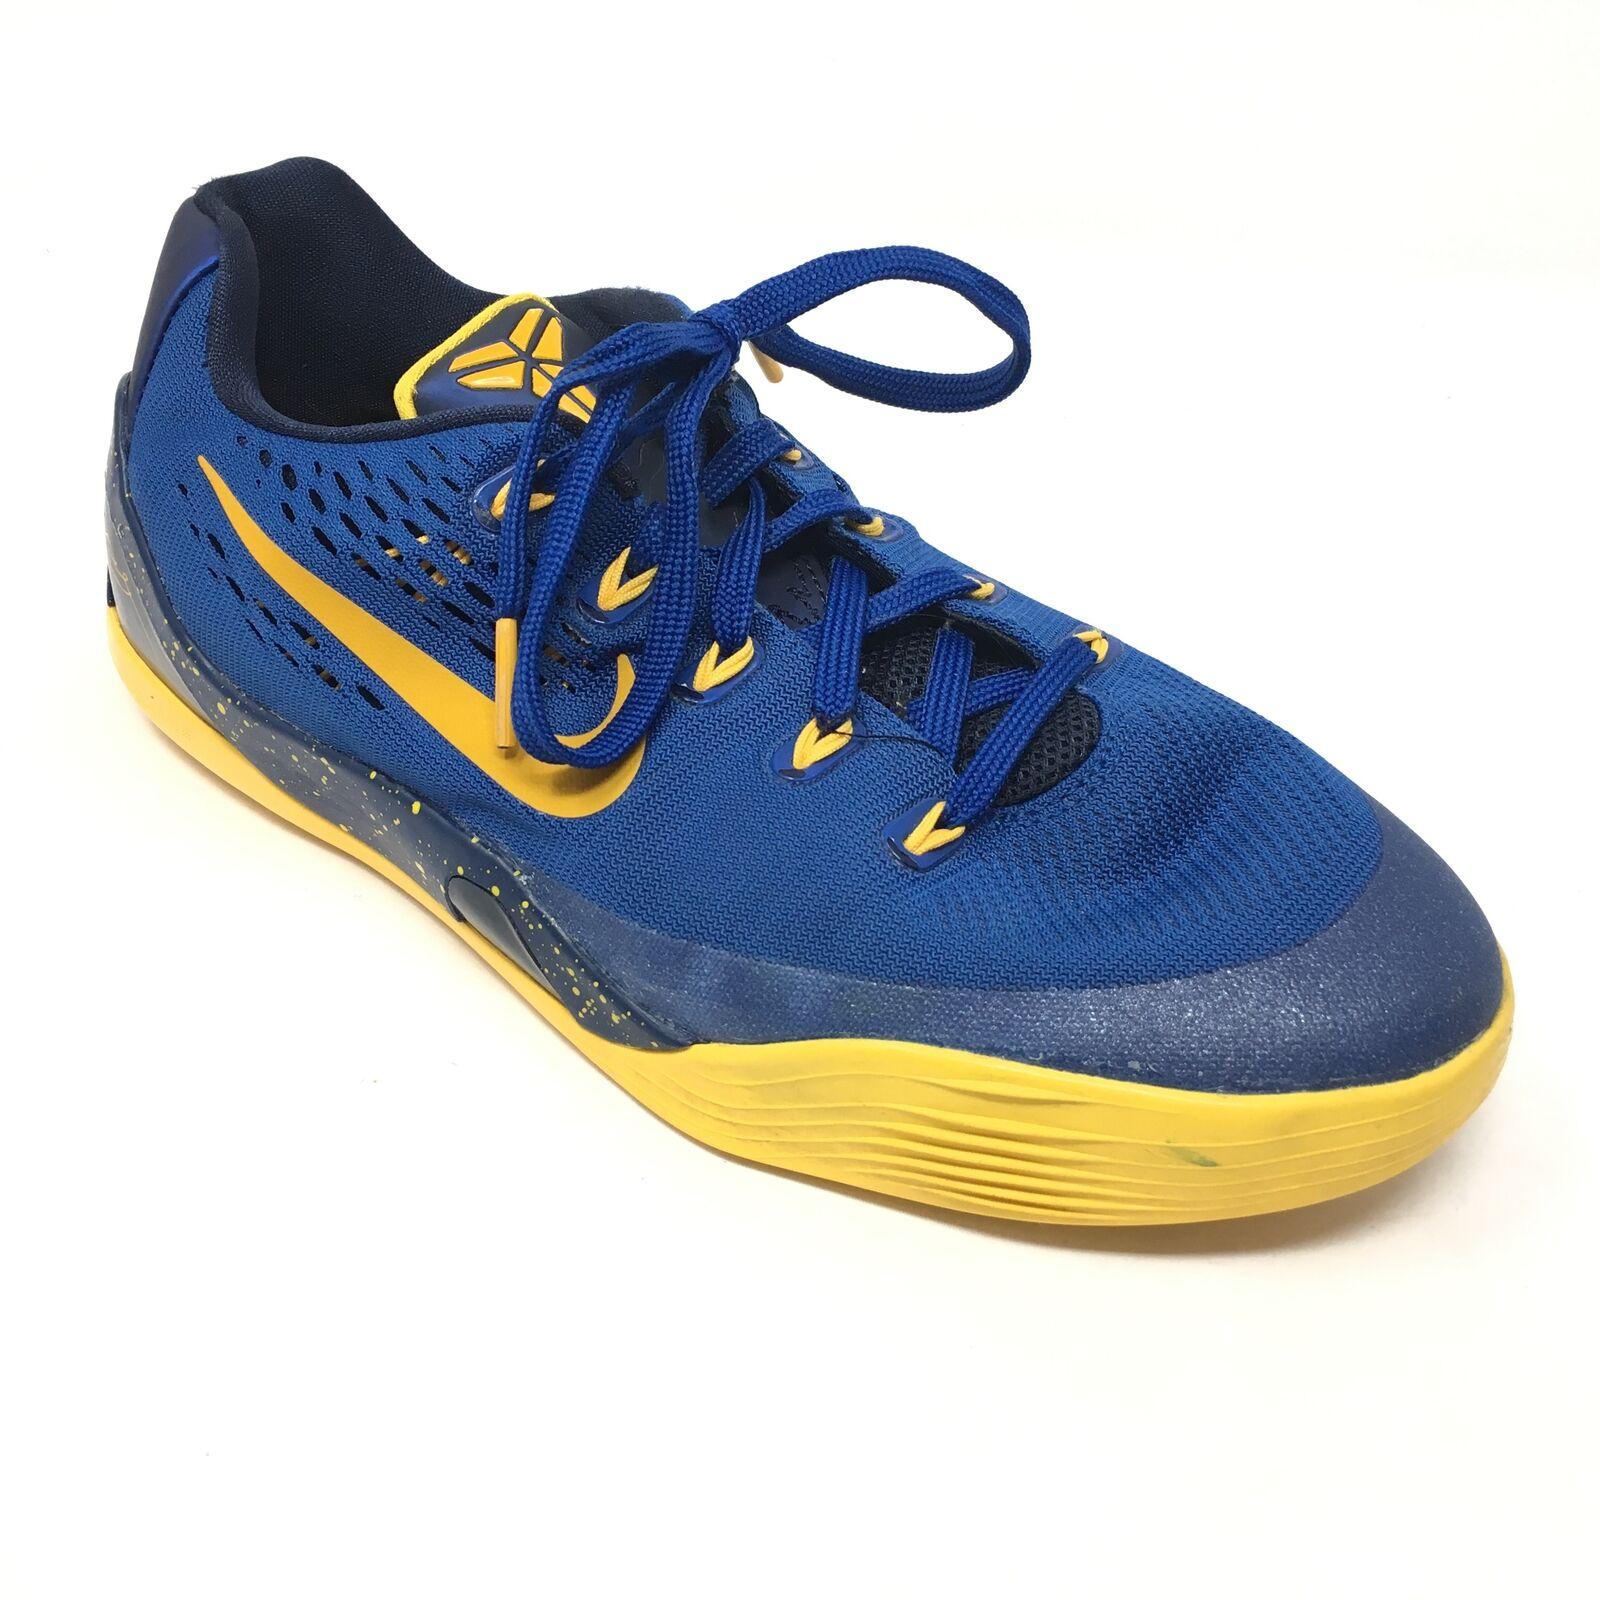 Men's Nike Kobe IX 9 EM Basketball shoes Sneakers Size 7M Gym bluee gold P12